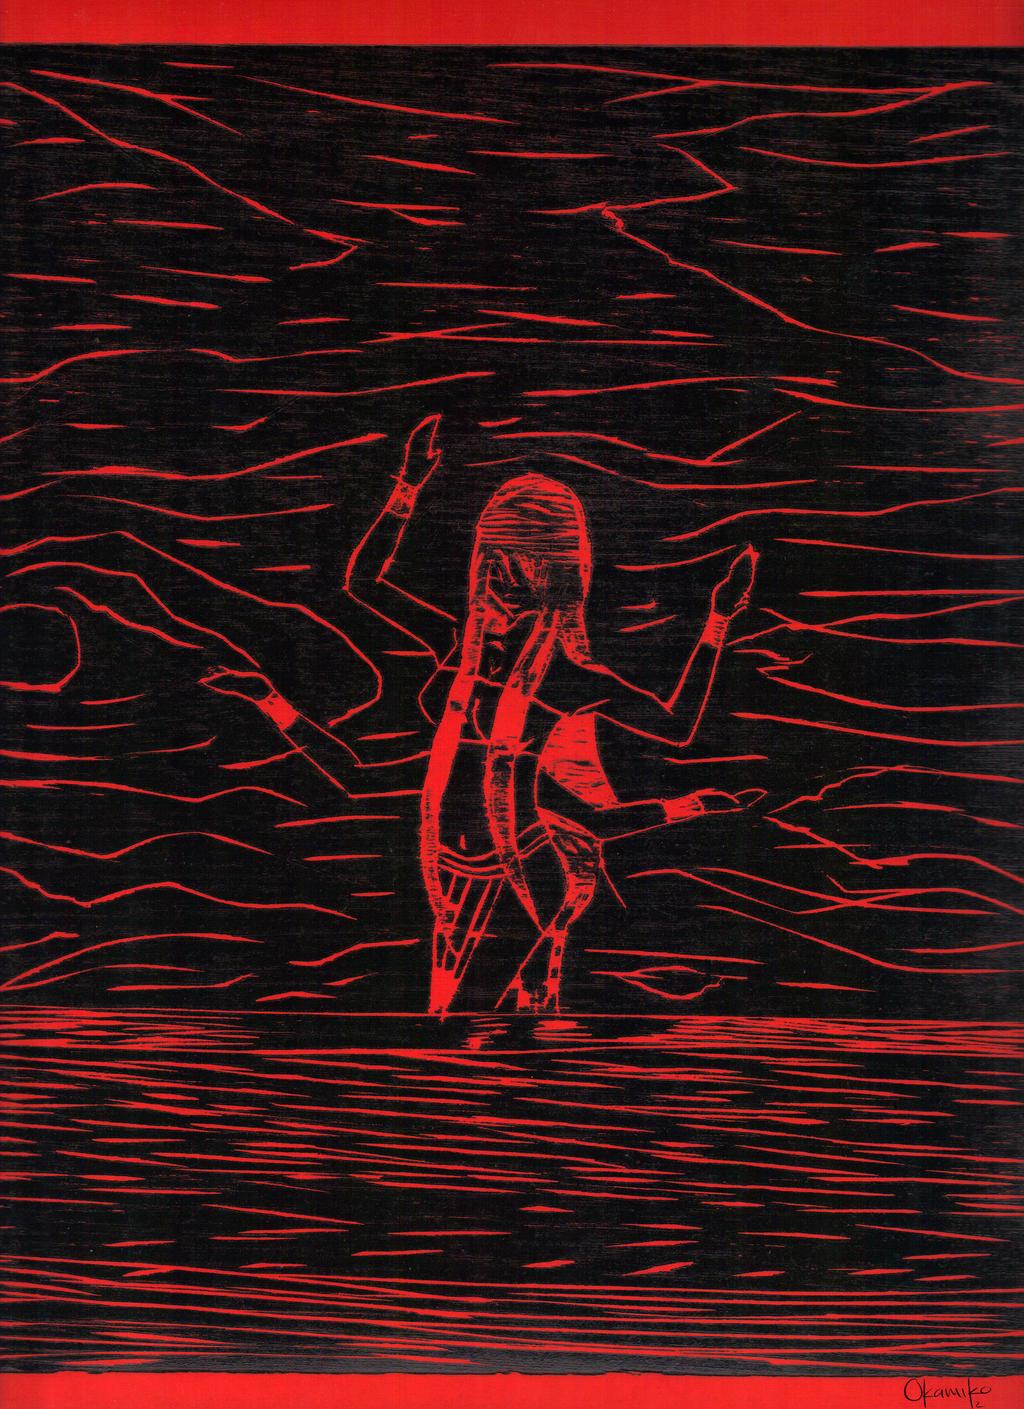 Psychedelic Dancing Ver. Red [Grabado] by syko-girl